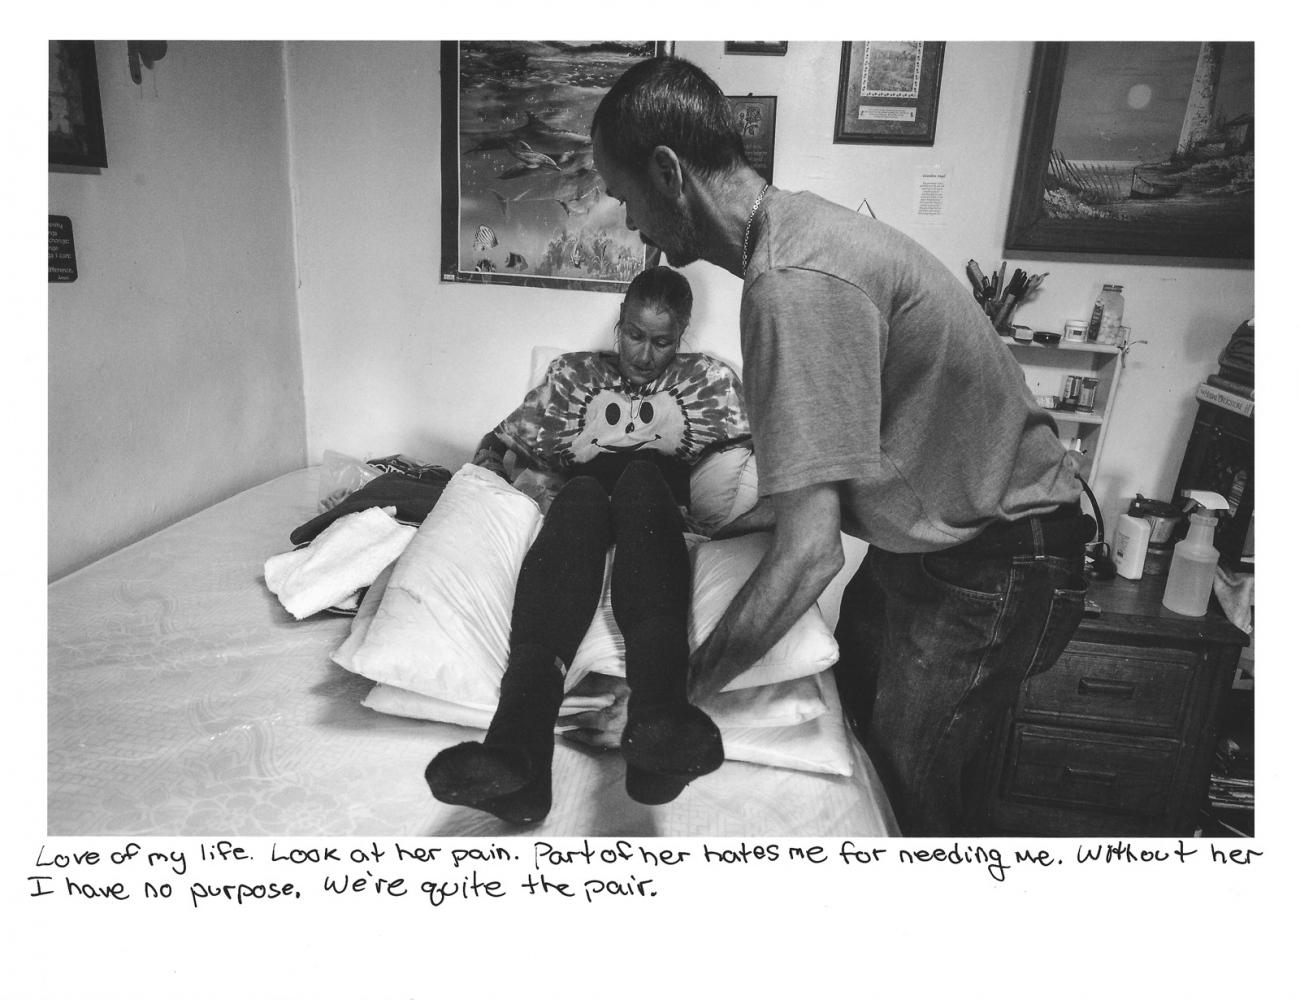 Art and Documentary Photography - Loading 31_HomeoftheBrave.jpg